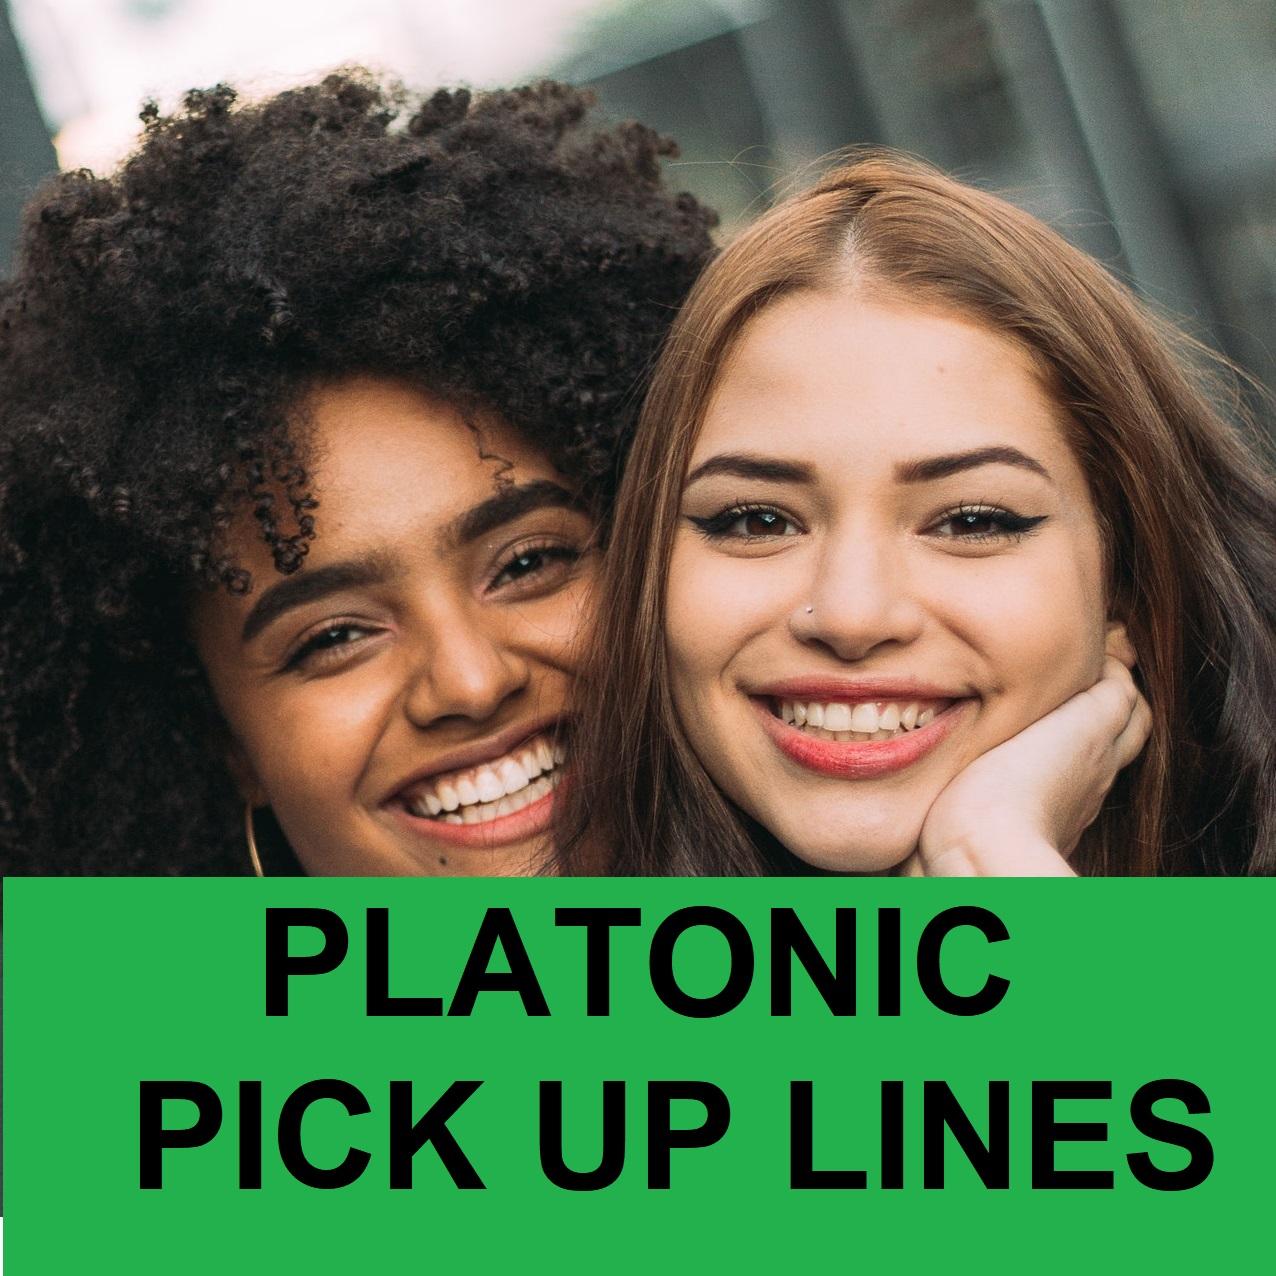 [Top 150] Friendship Platonic BFF Pick Up Lines